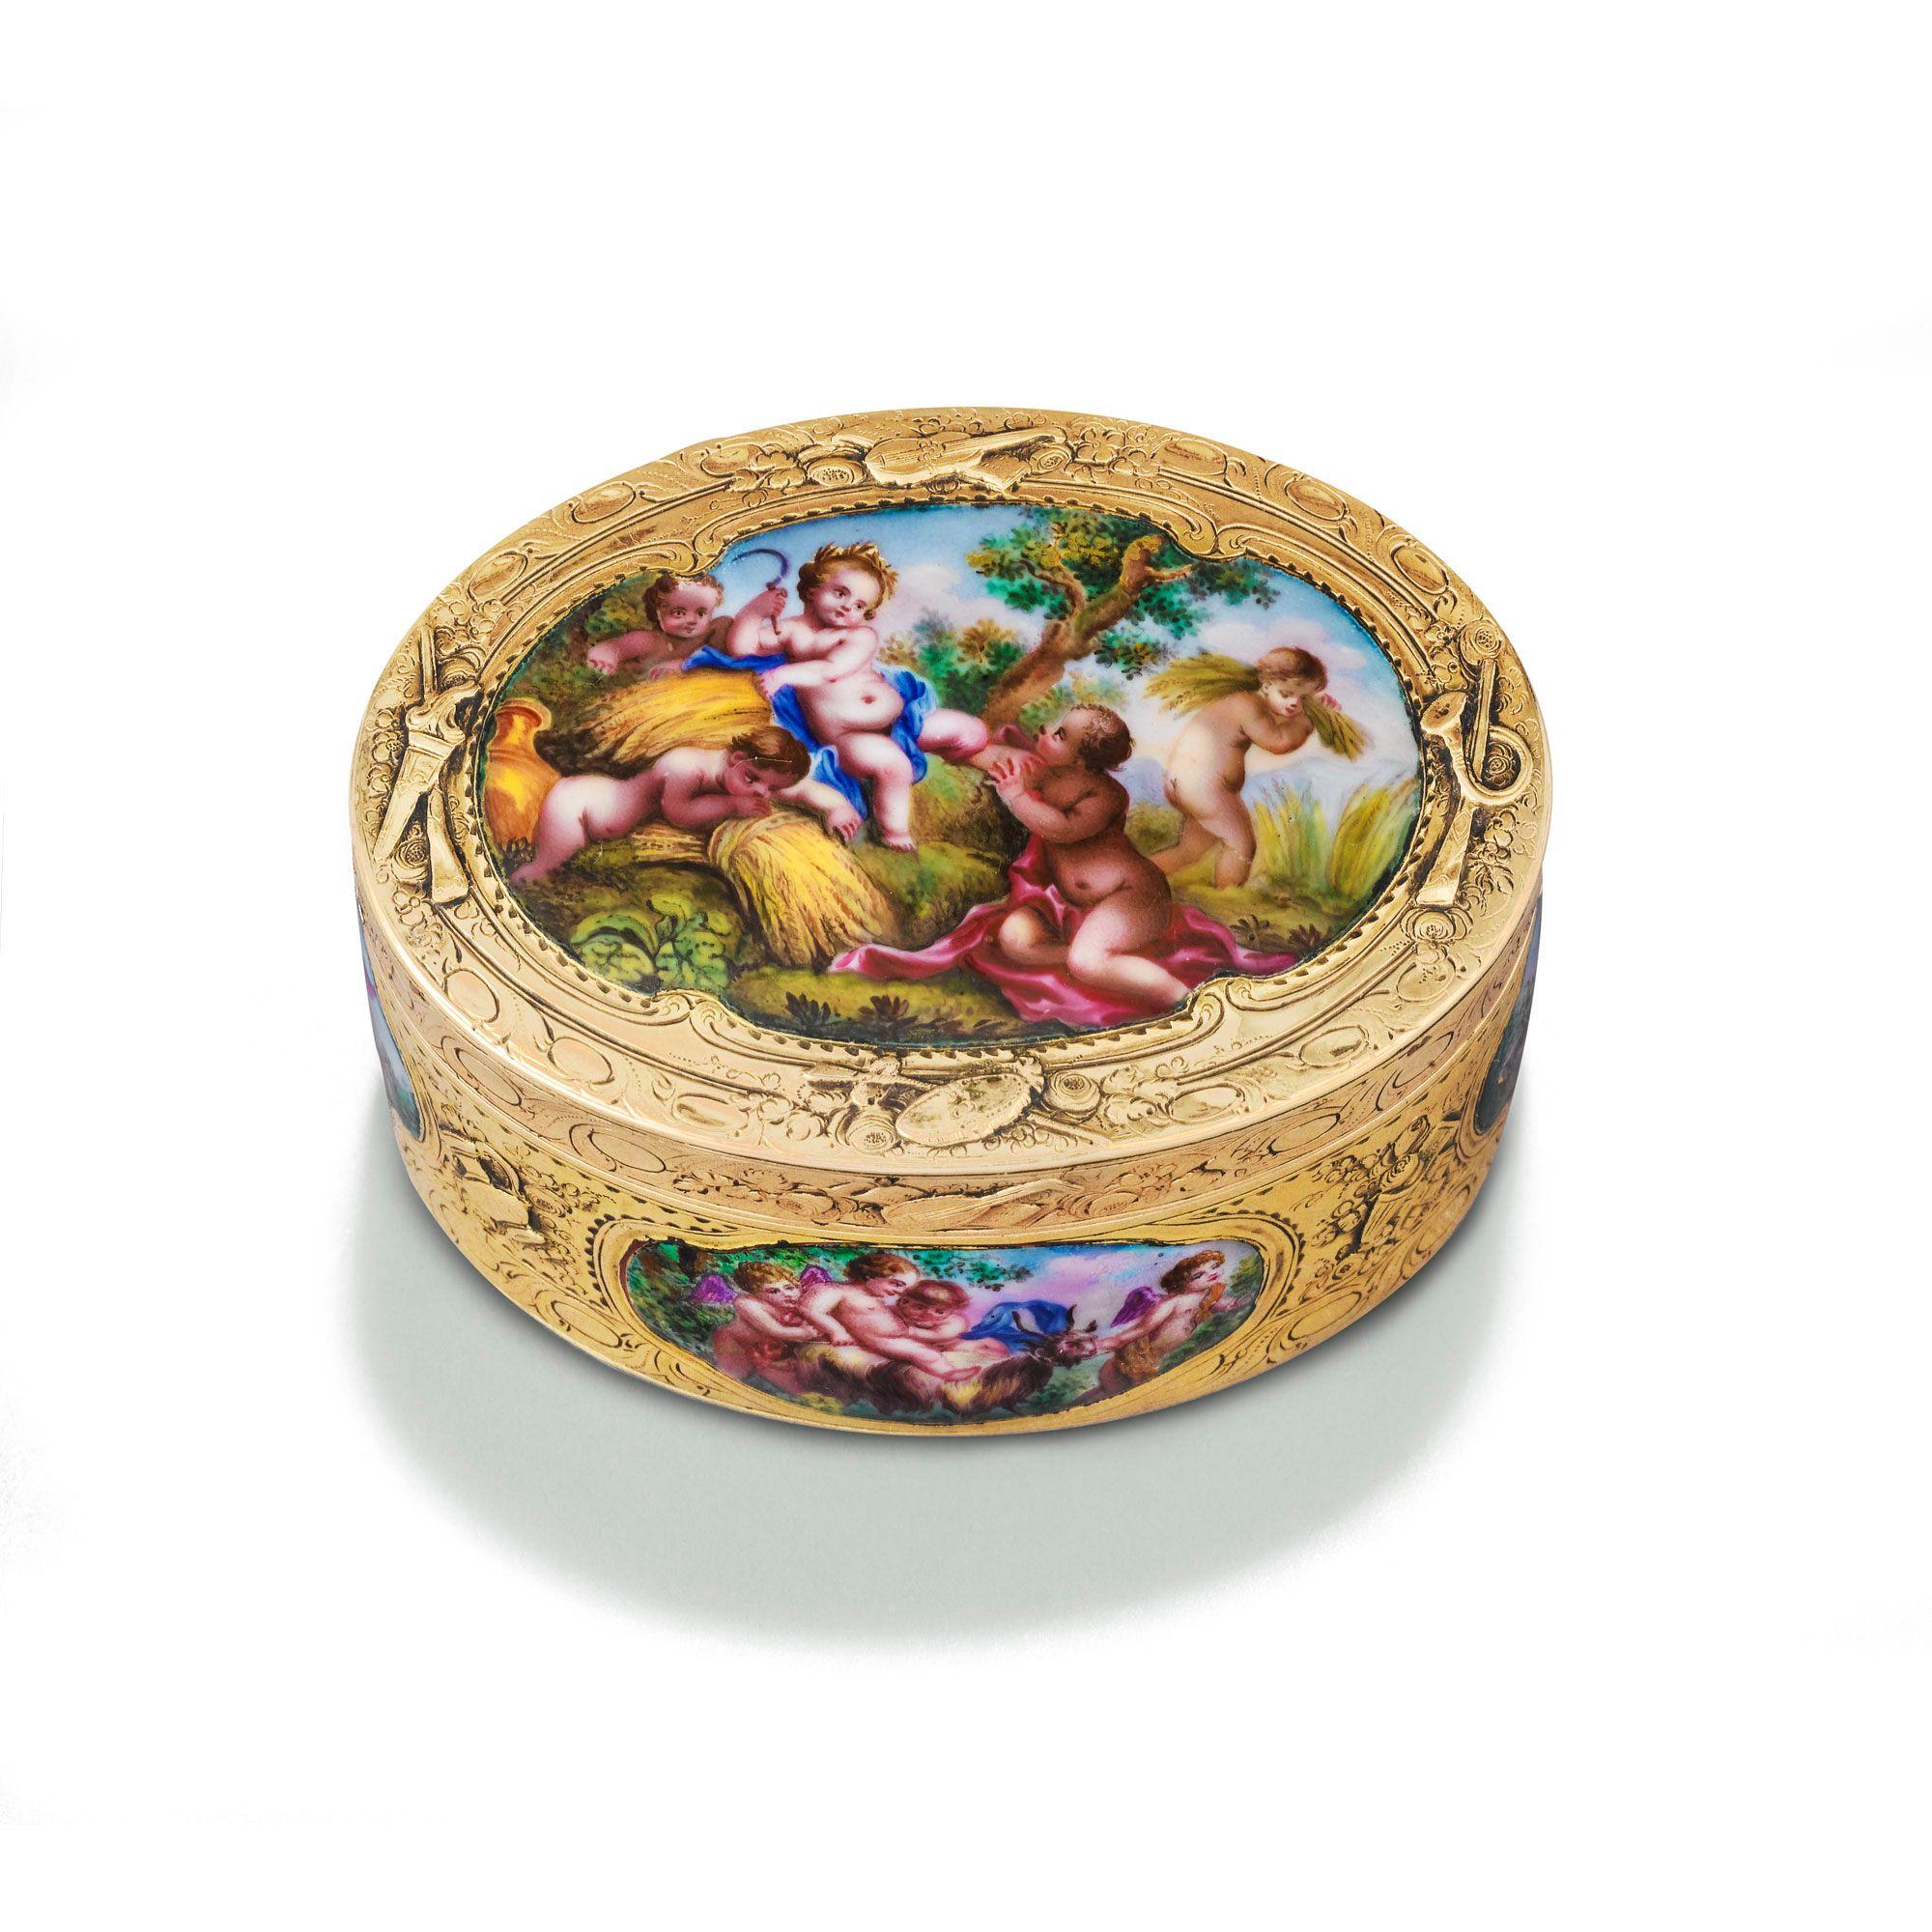 <p>tabatière ovale en or et émail en plein, | | sotheby's pf1012lot5mgnhen